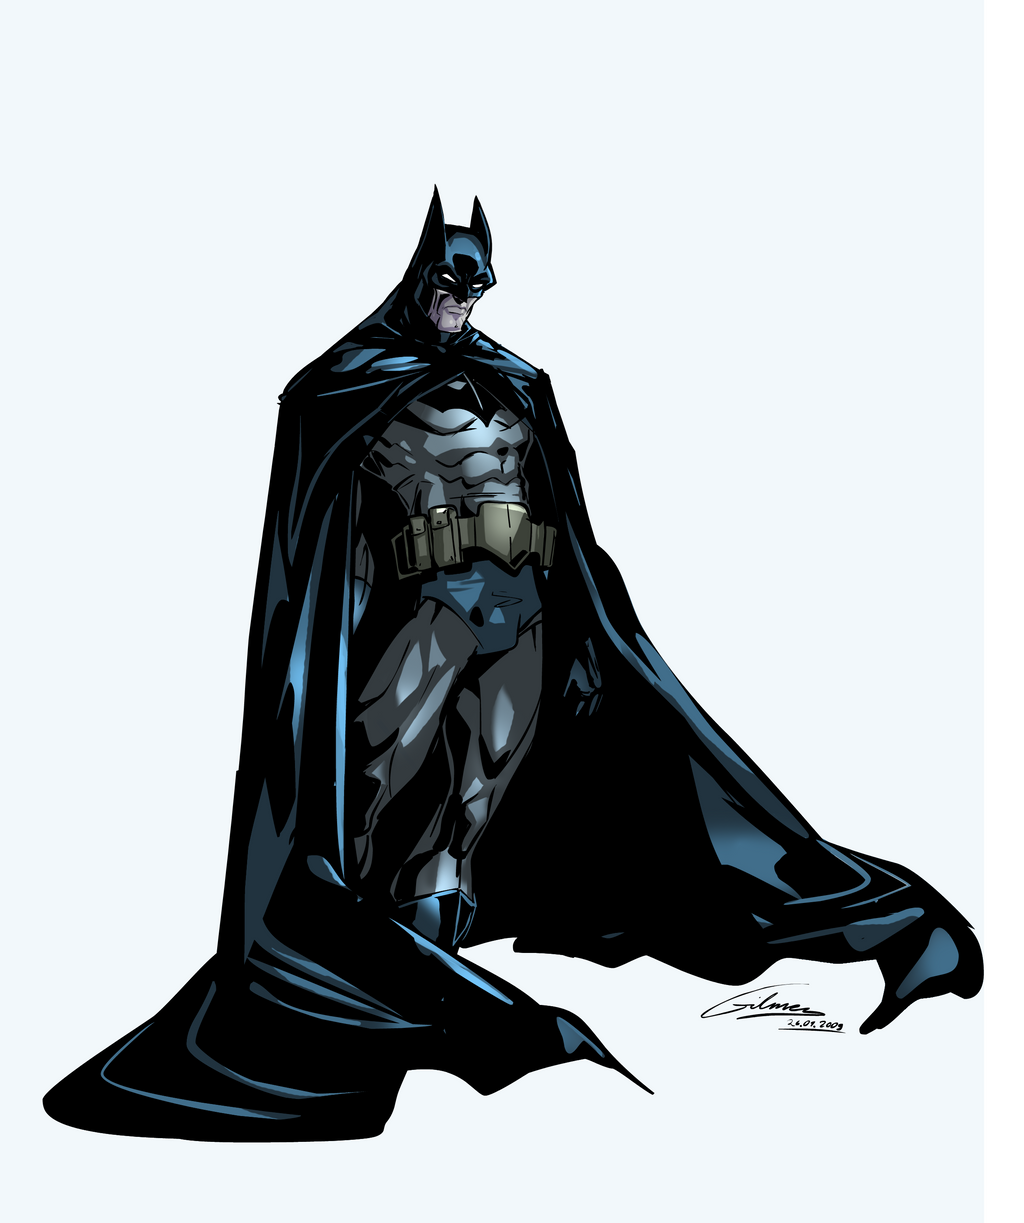 Batman_0901_by_Gilmec.png